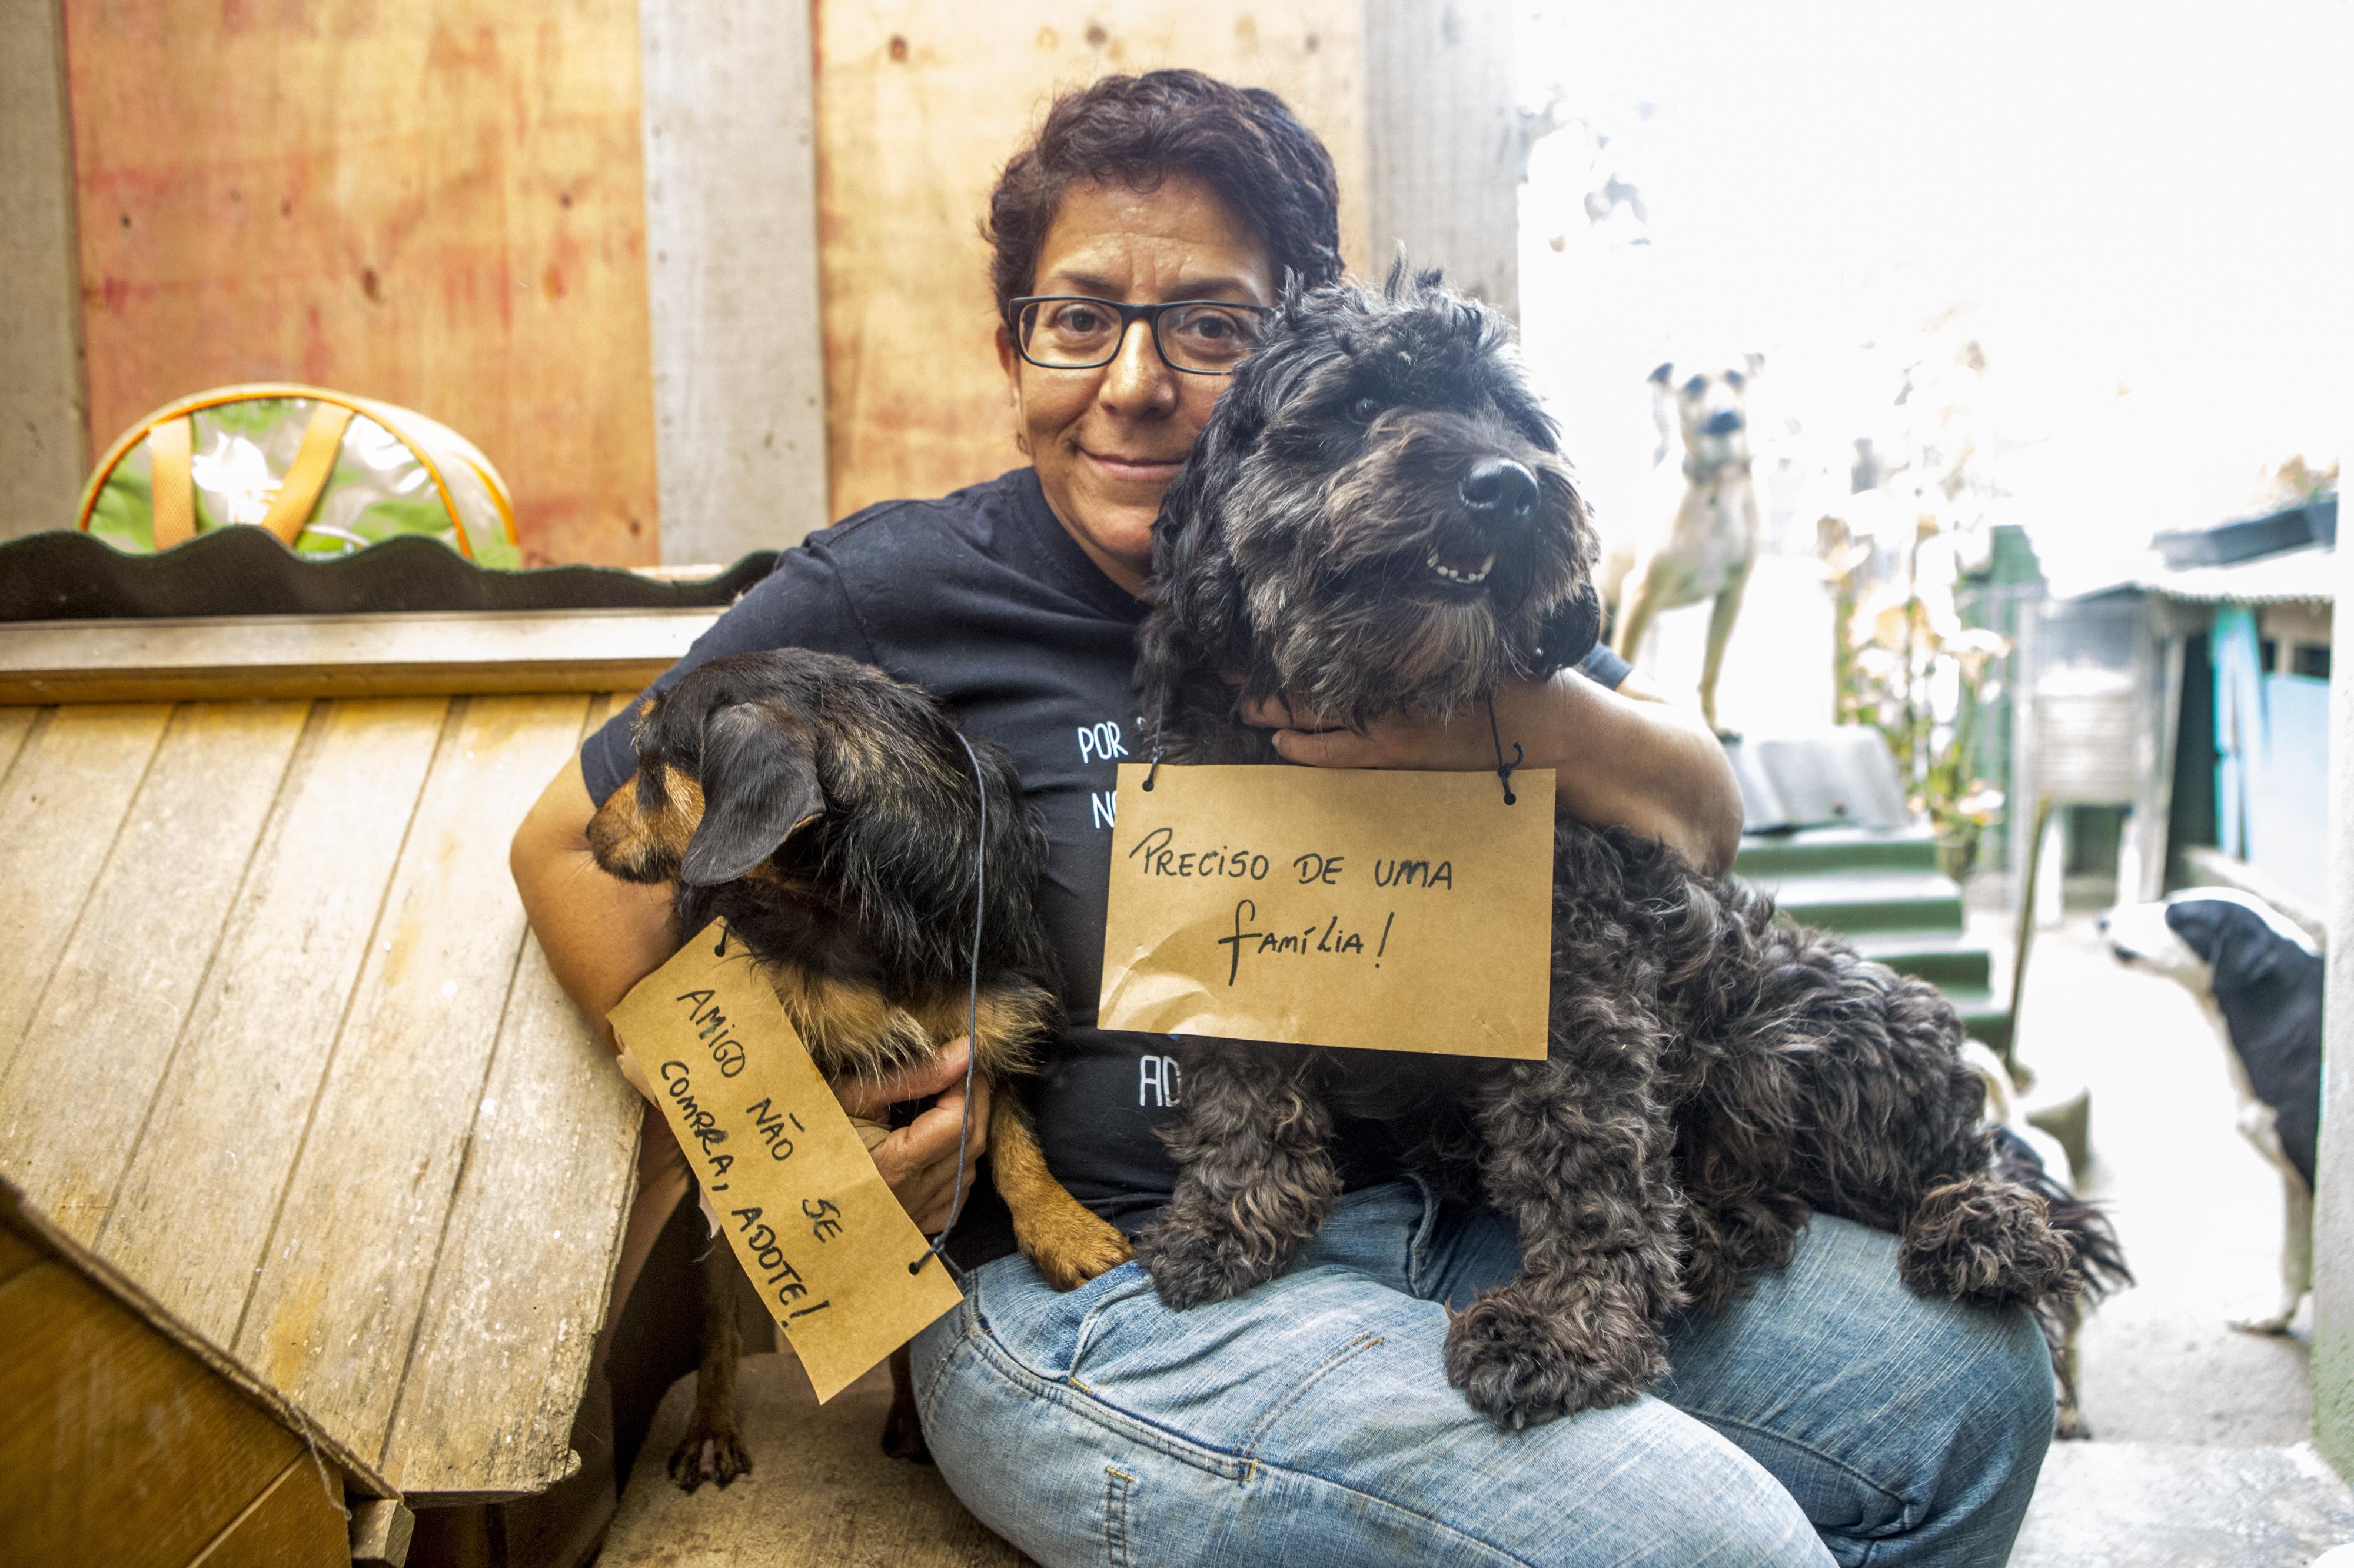 Rosa Villanueva dedica seu tempo, afeto e dinheiro aos bichos - Flávio Tin/ND